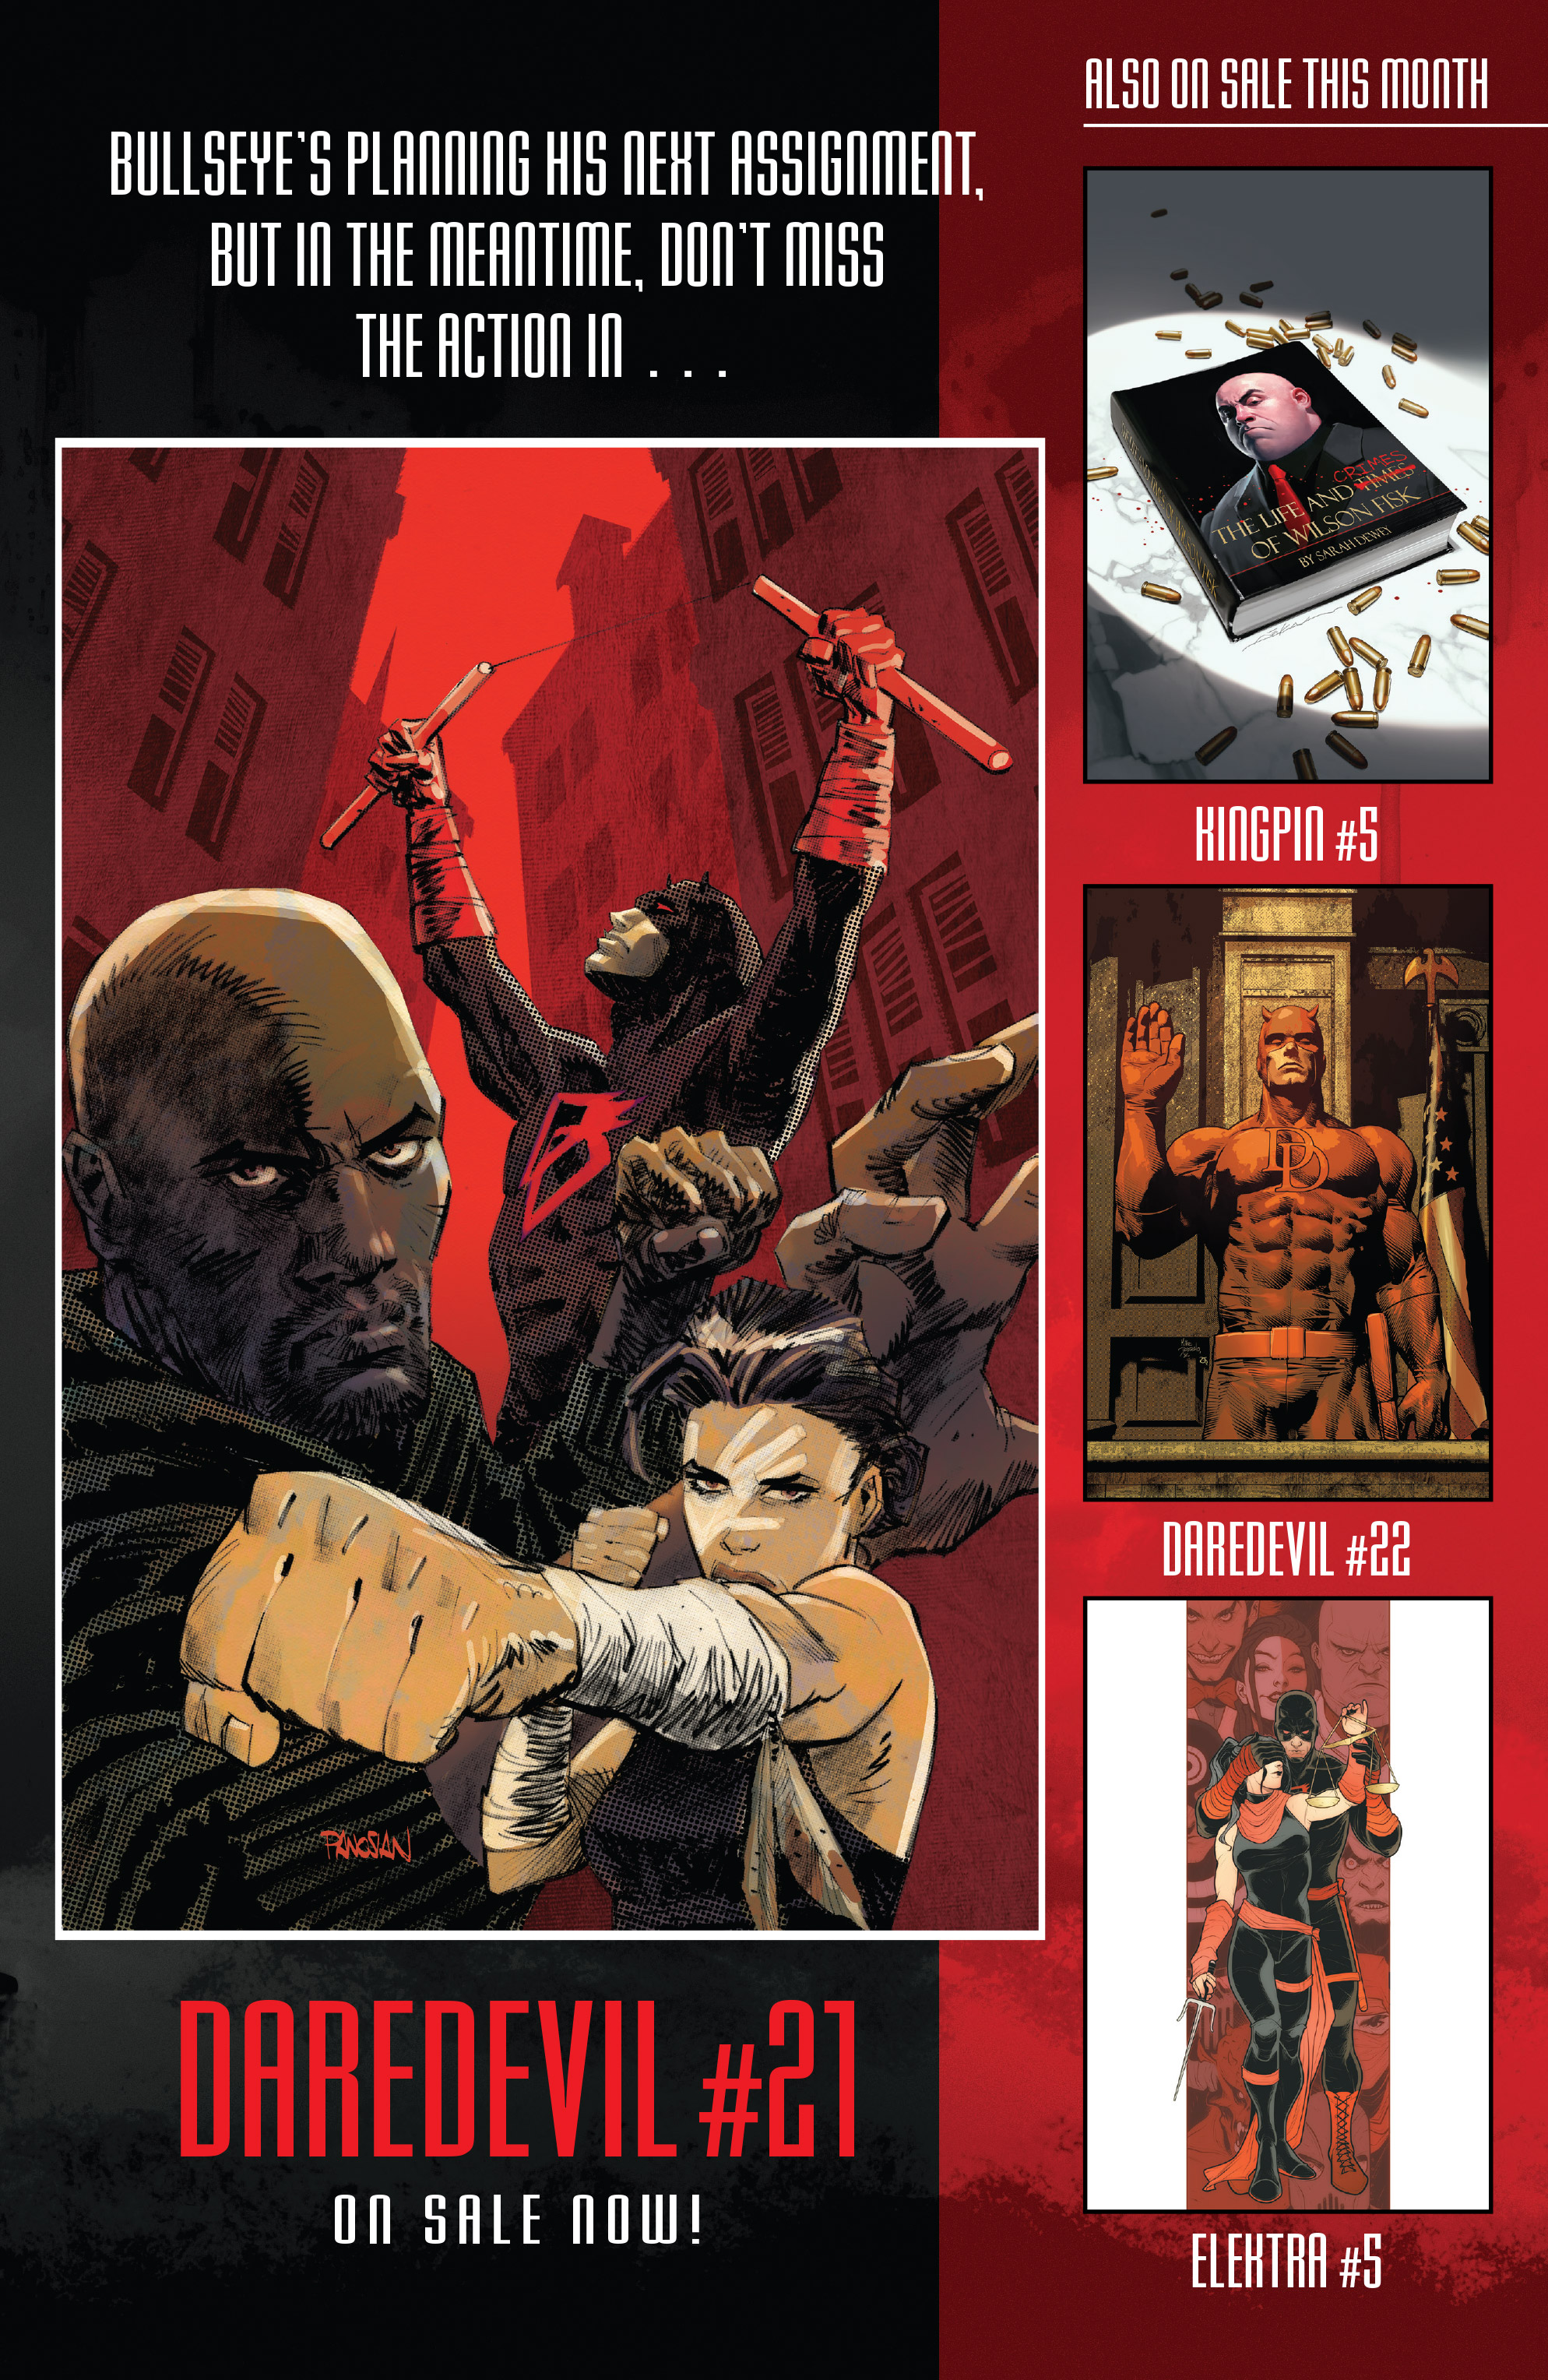 Read online Bullseye comic -  Issue #5 - 22